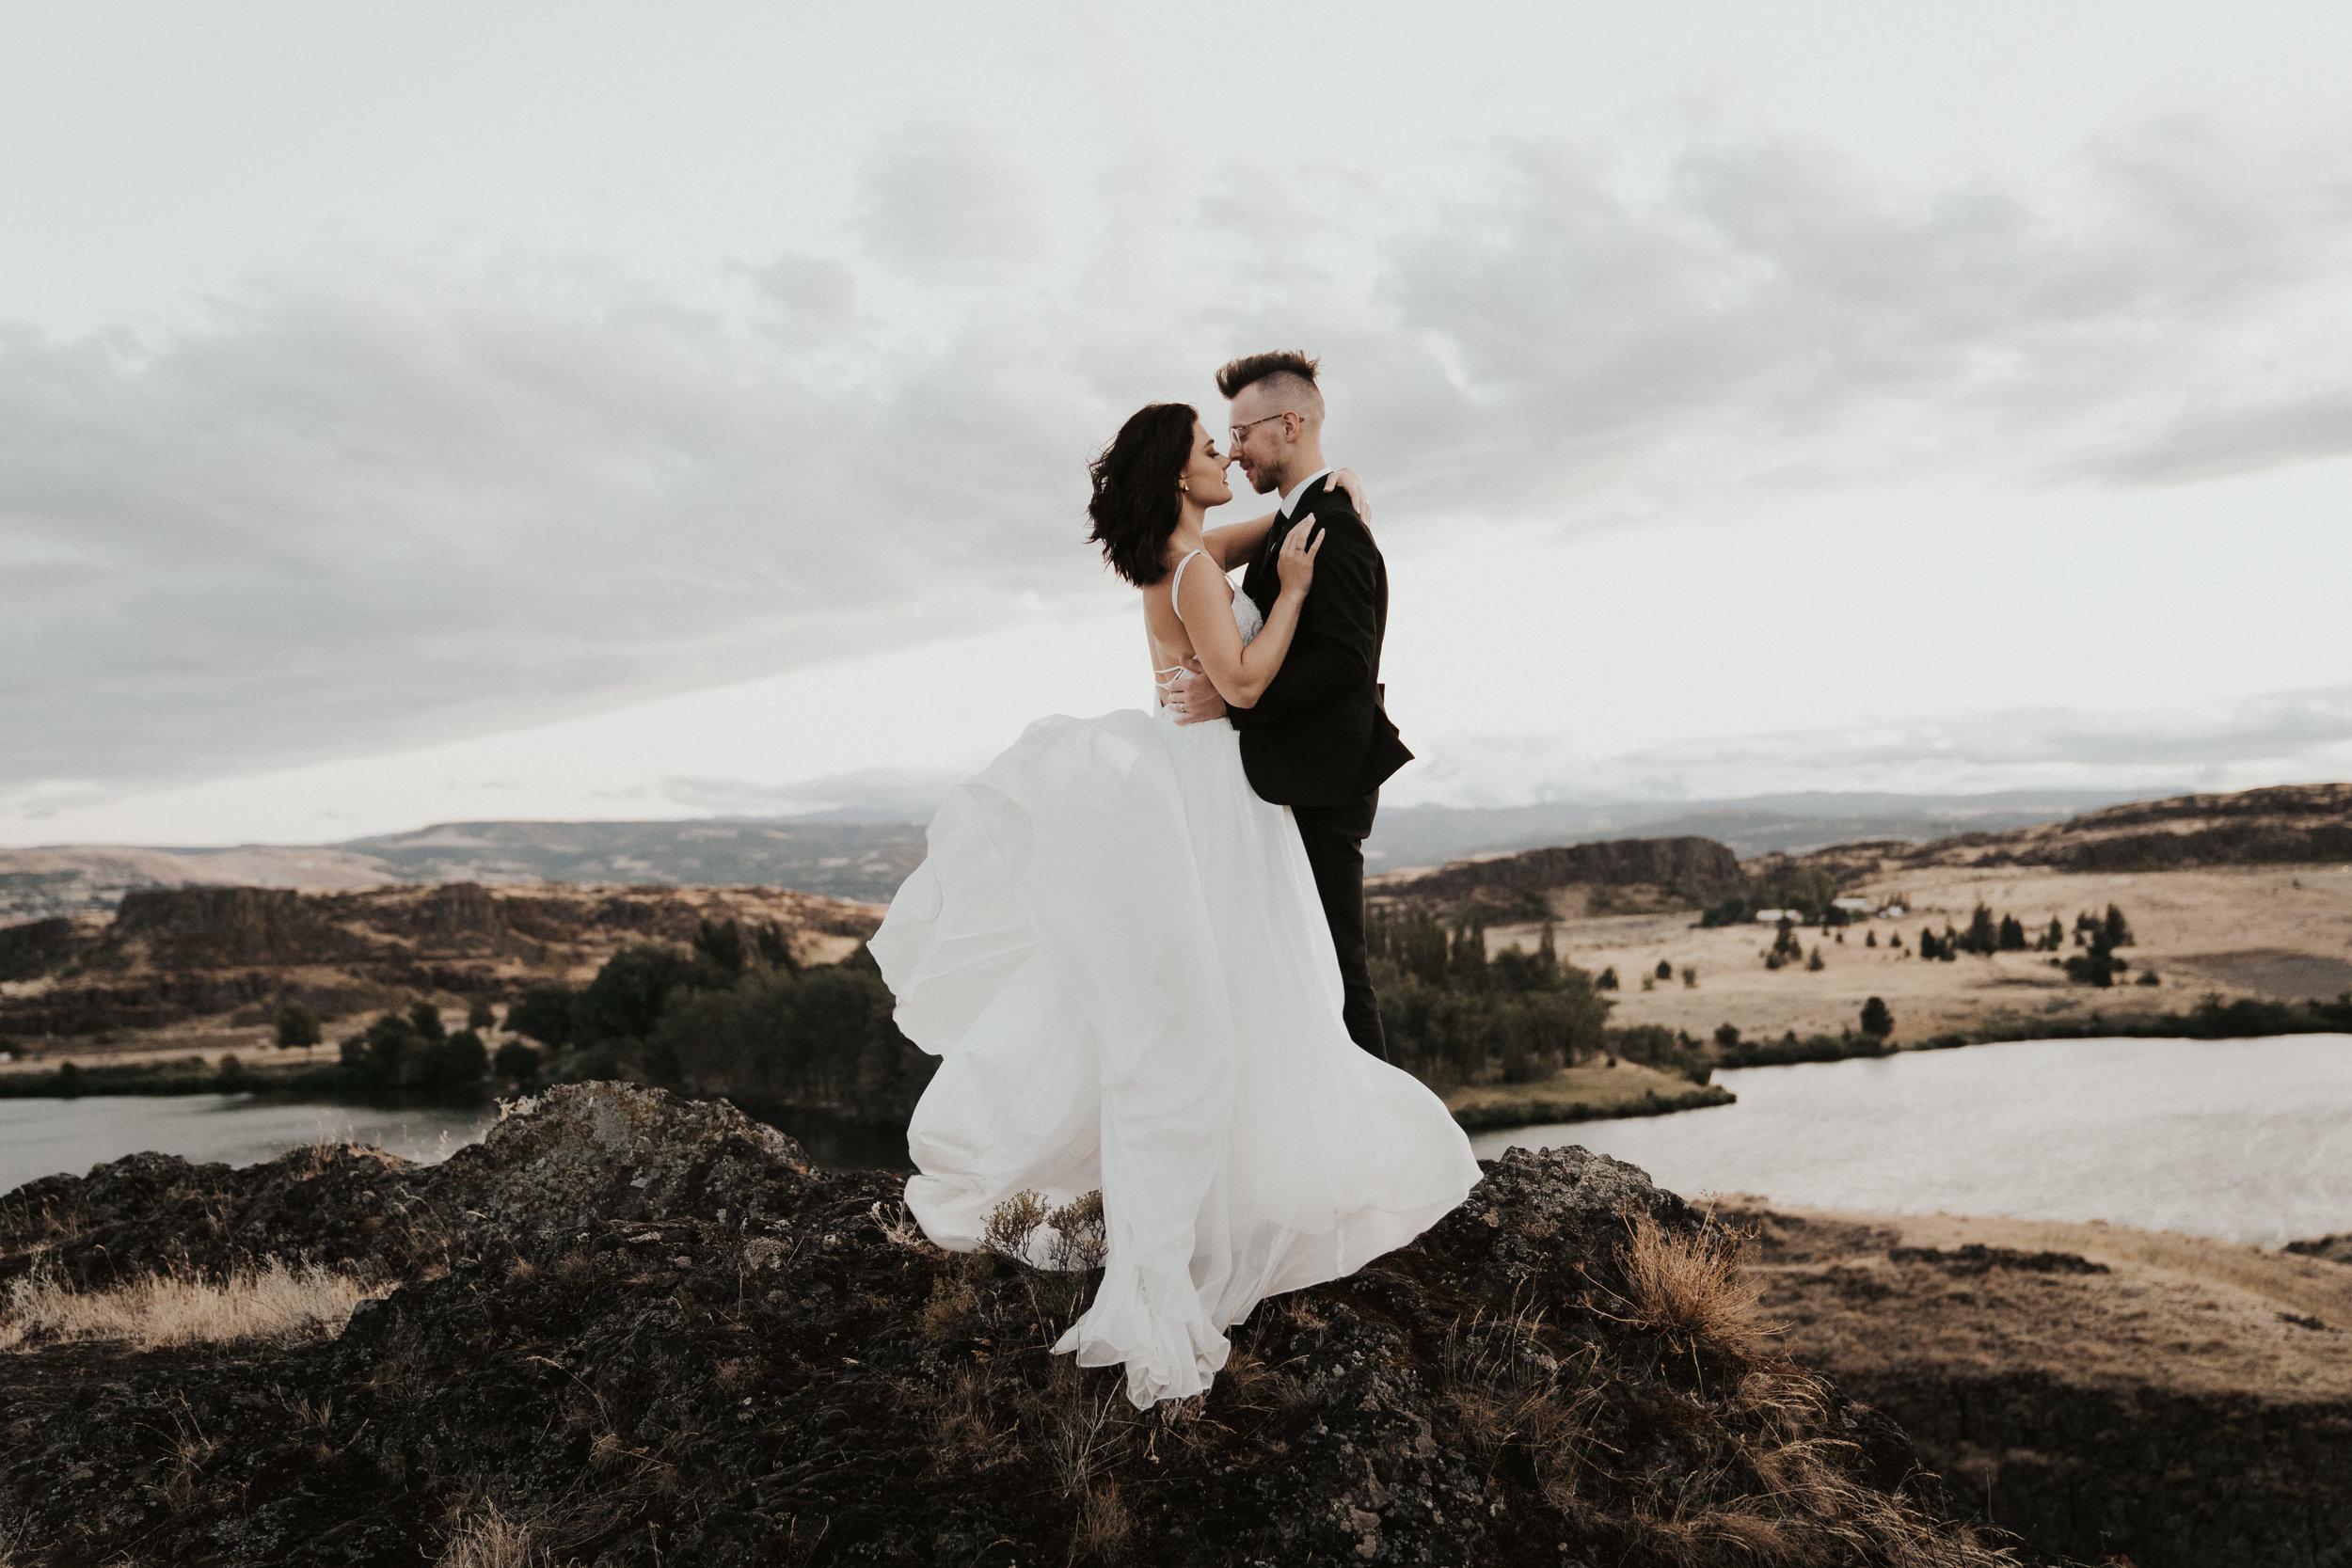 columbia-river-gorge-wedding-elopement-inspiration-45.jpg